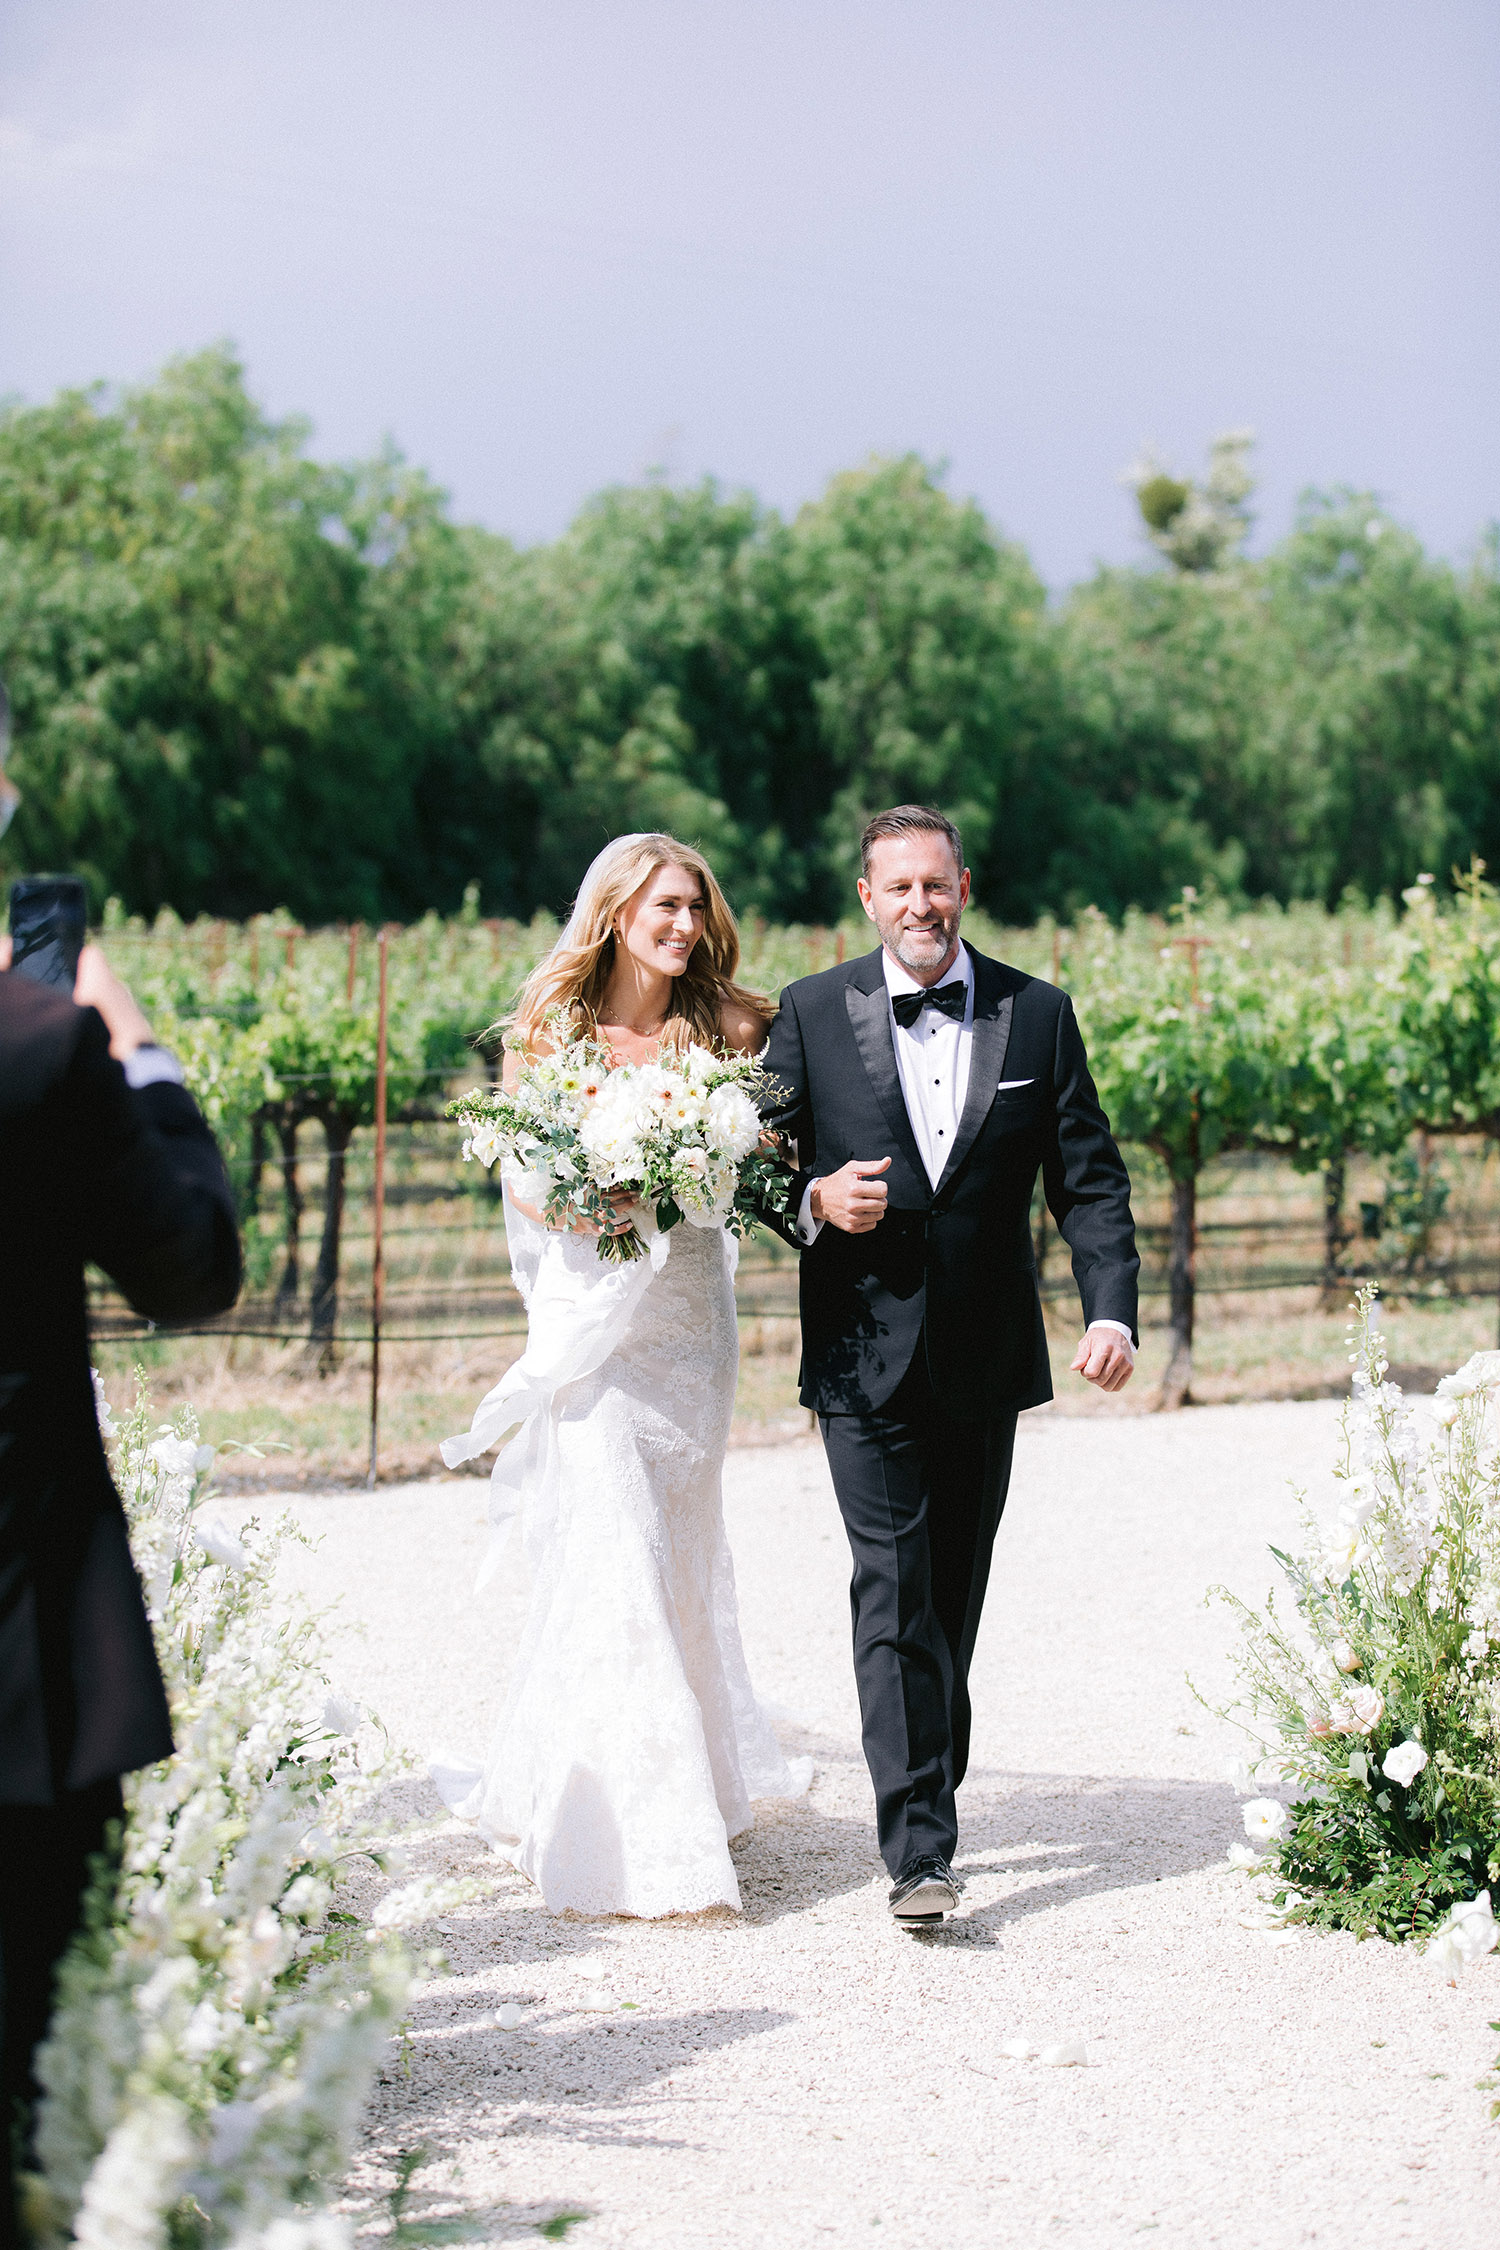 kati erik wedding bride and father walk down the aisle